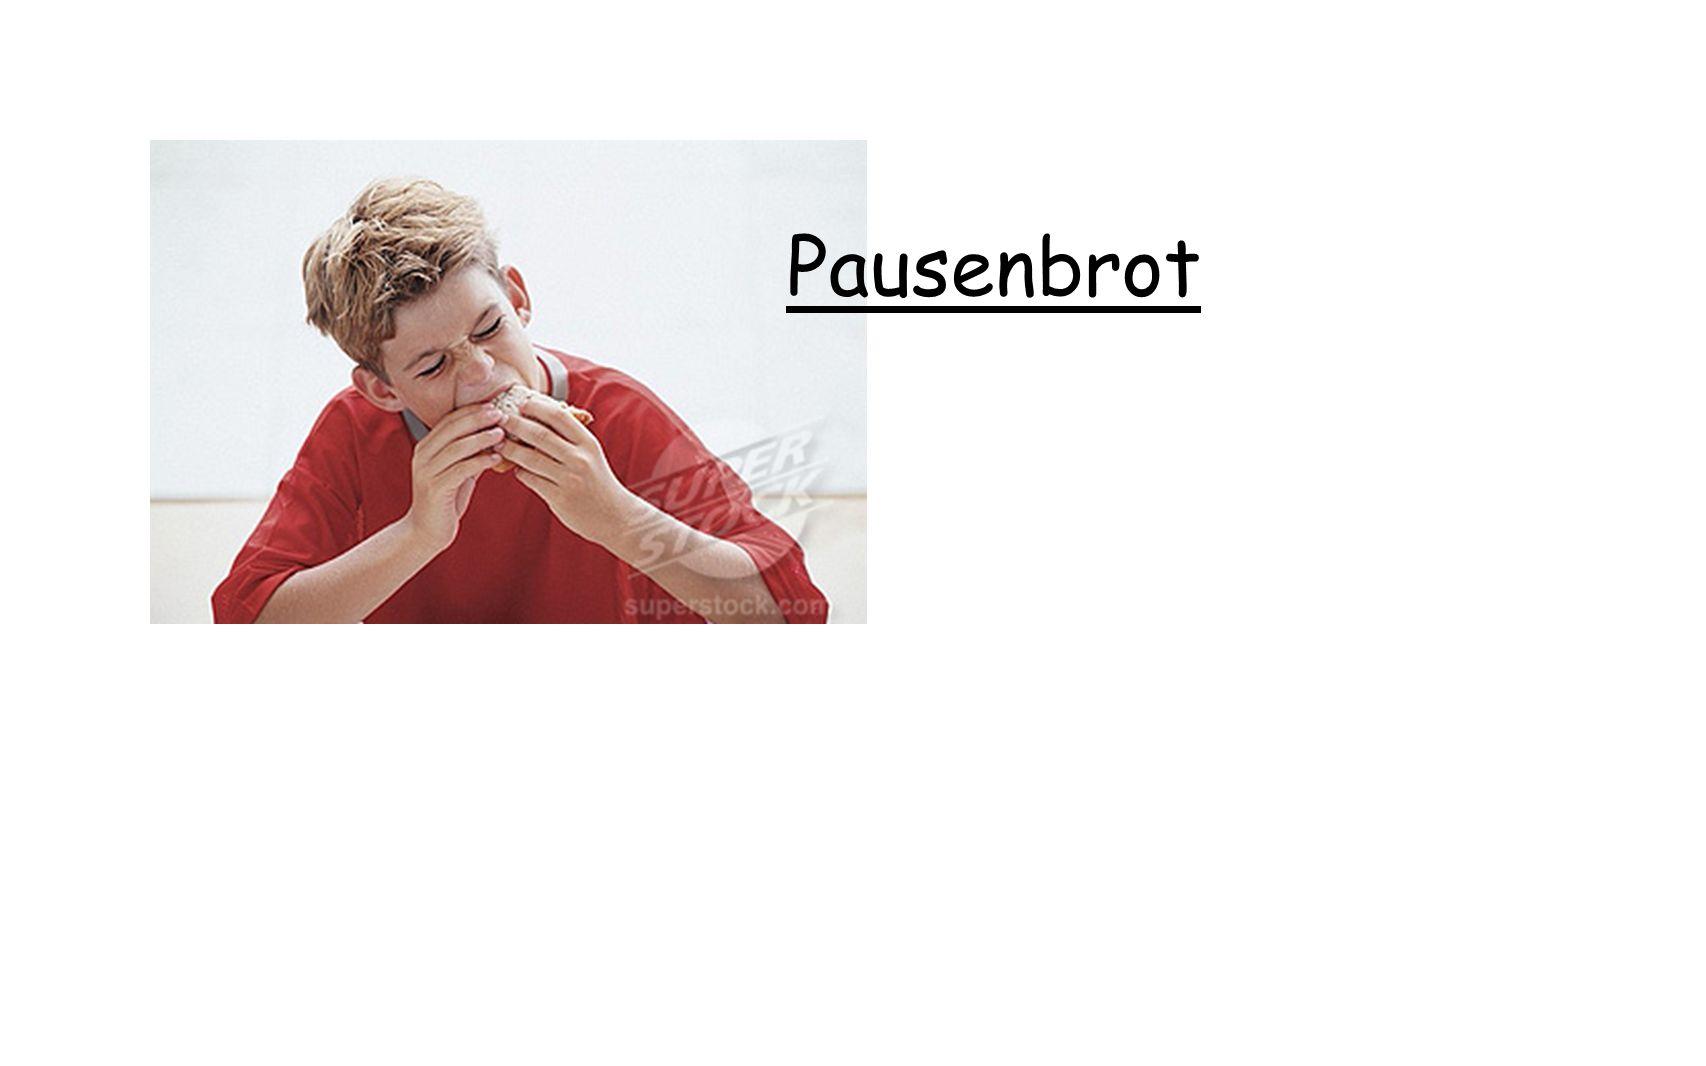 Pausenbrot